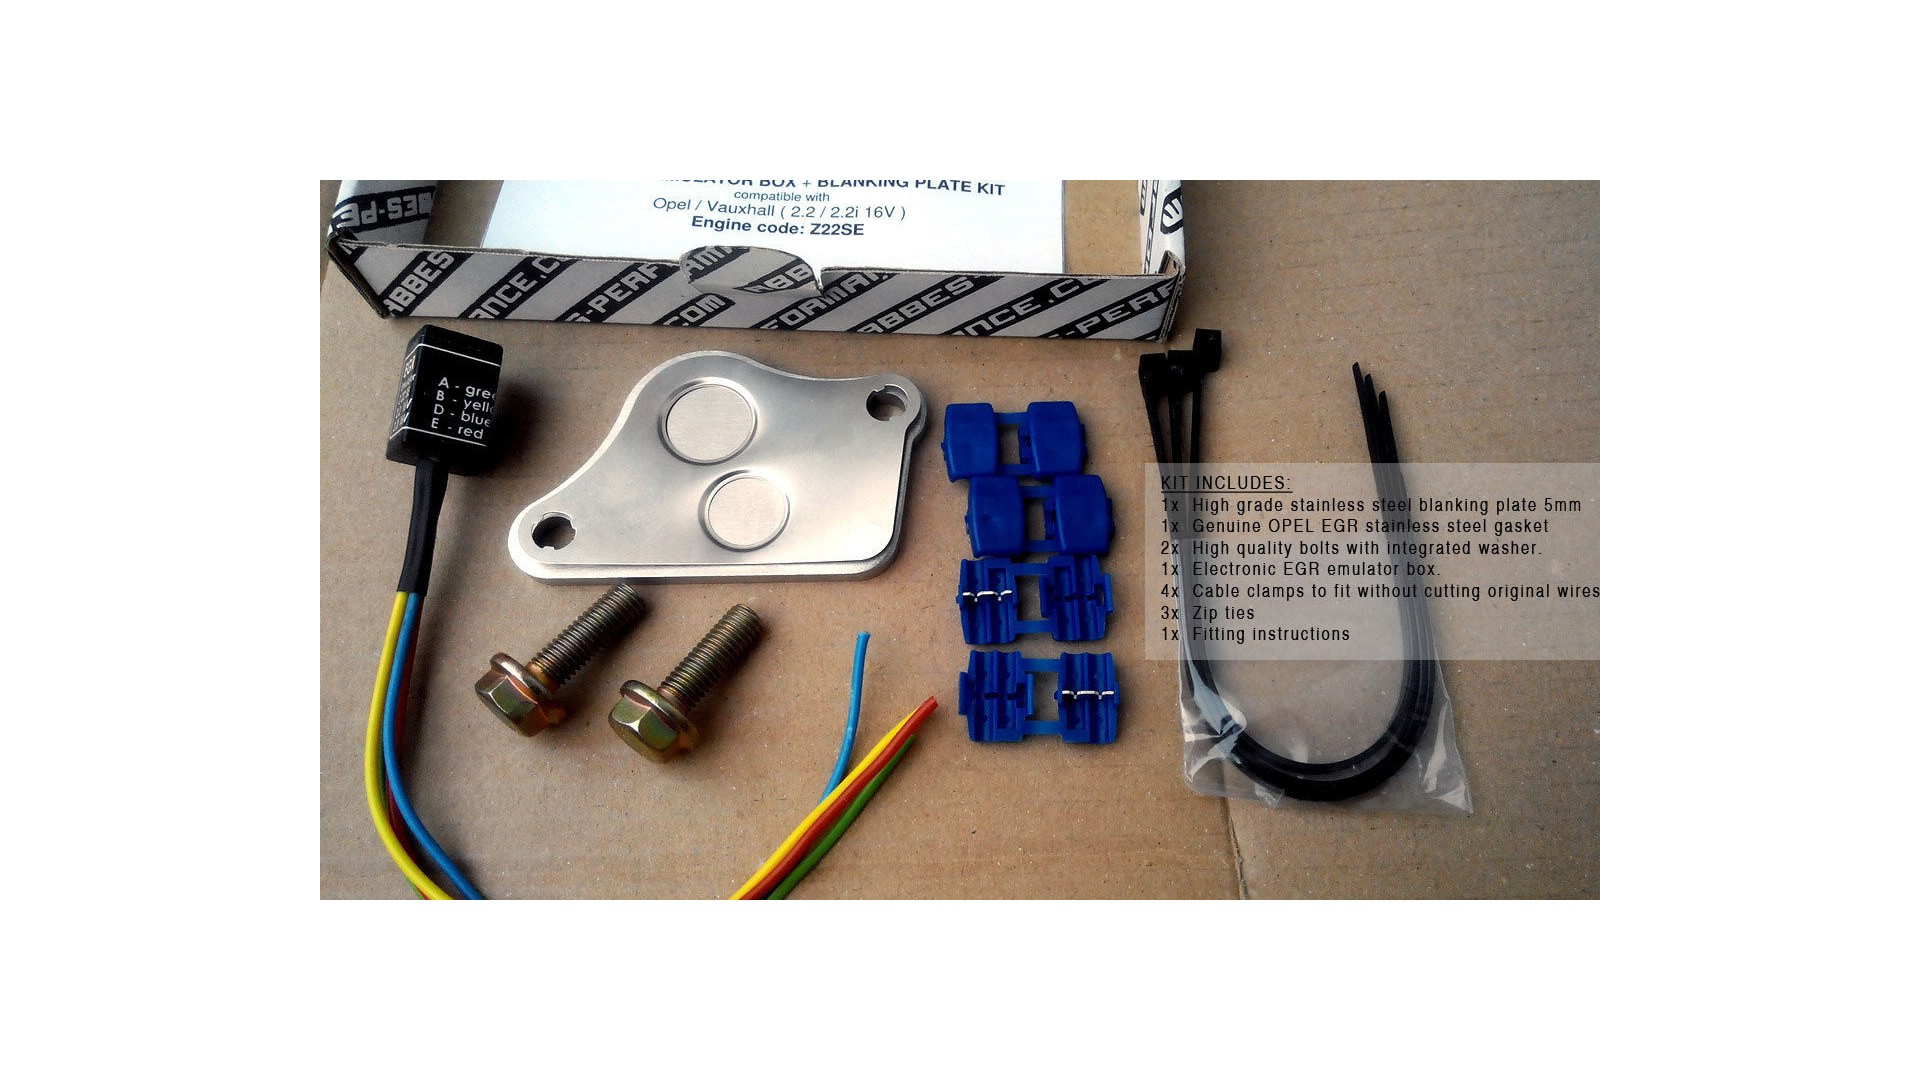 Egr Emulator Simulator Box Blanking Plate Kit Z22se 22 16v Opel Electrical Wiring Vauxhall